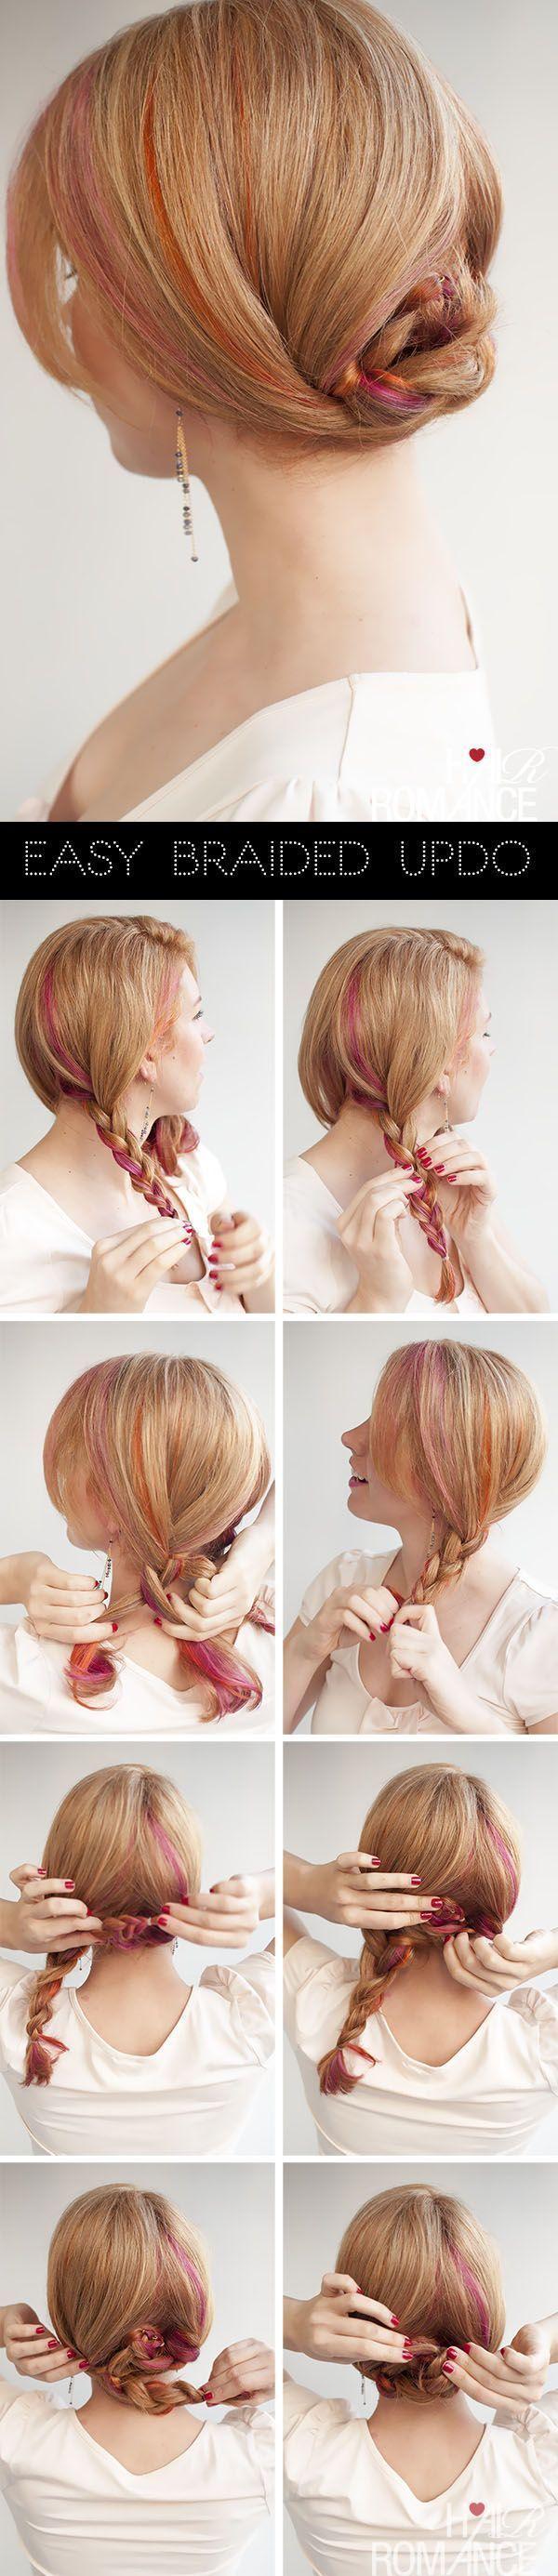 Hair romance easy braid updo hairstyle tutorial braided